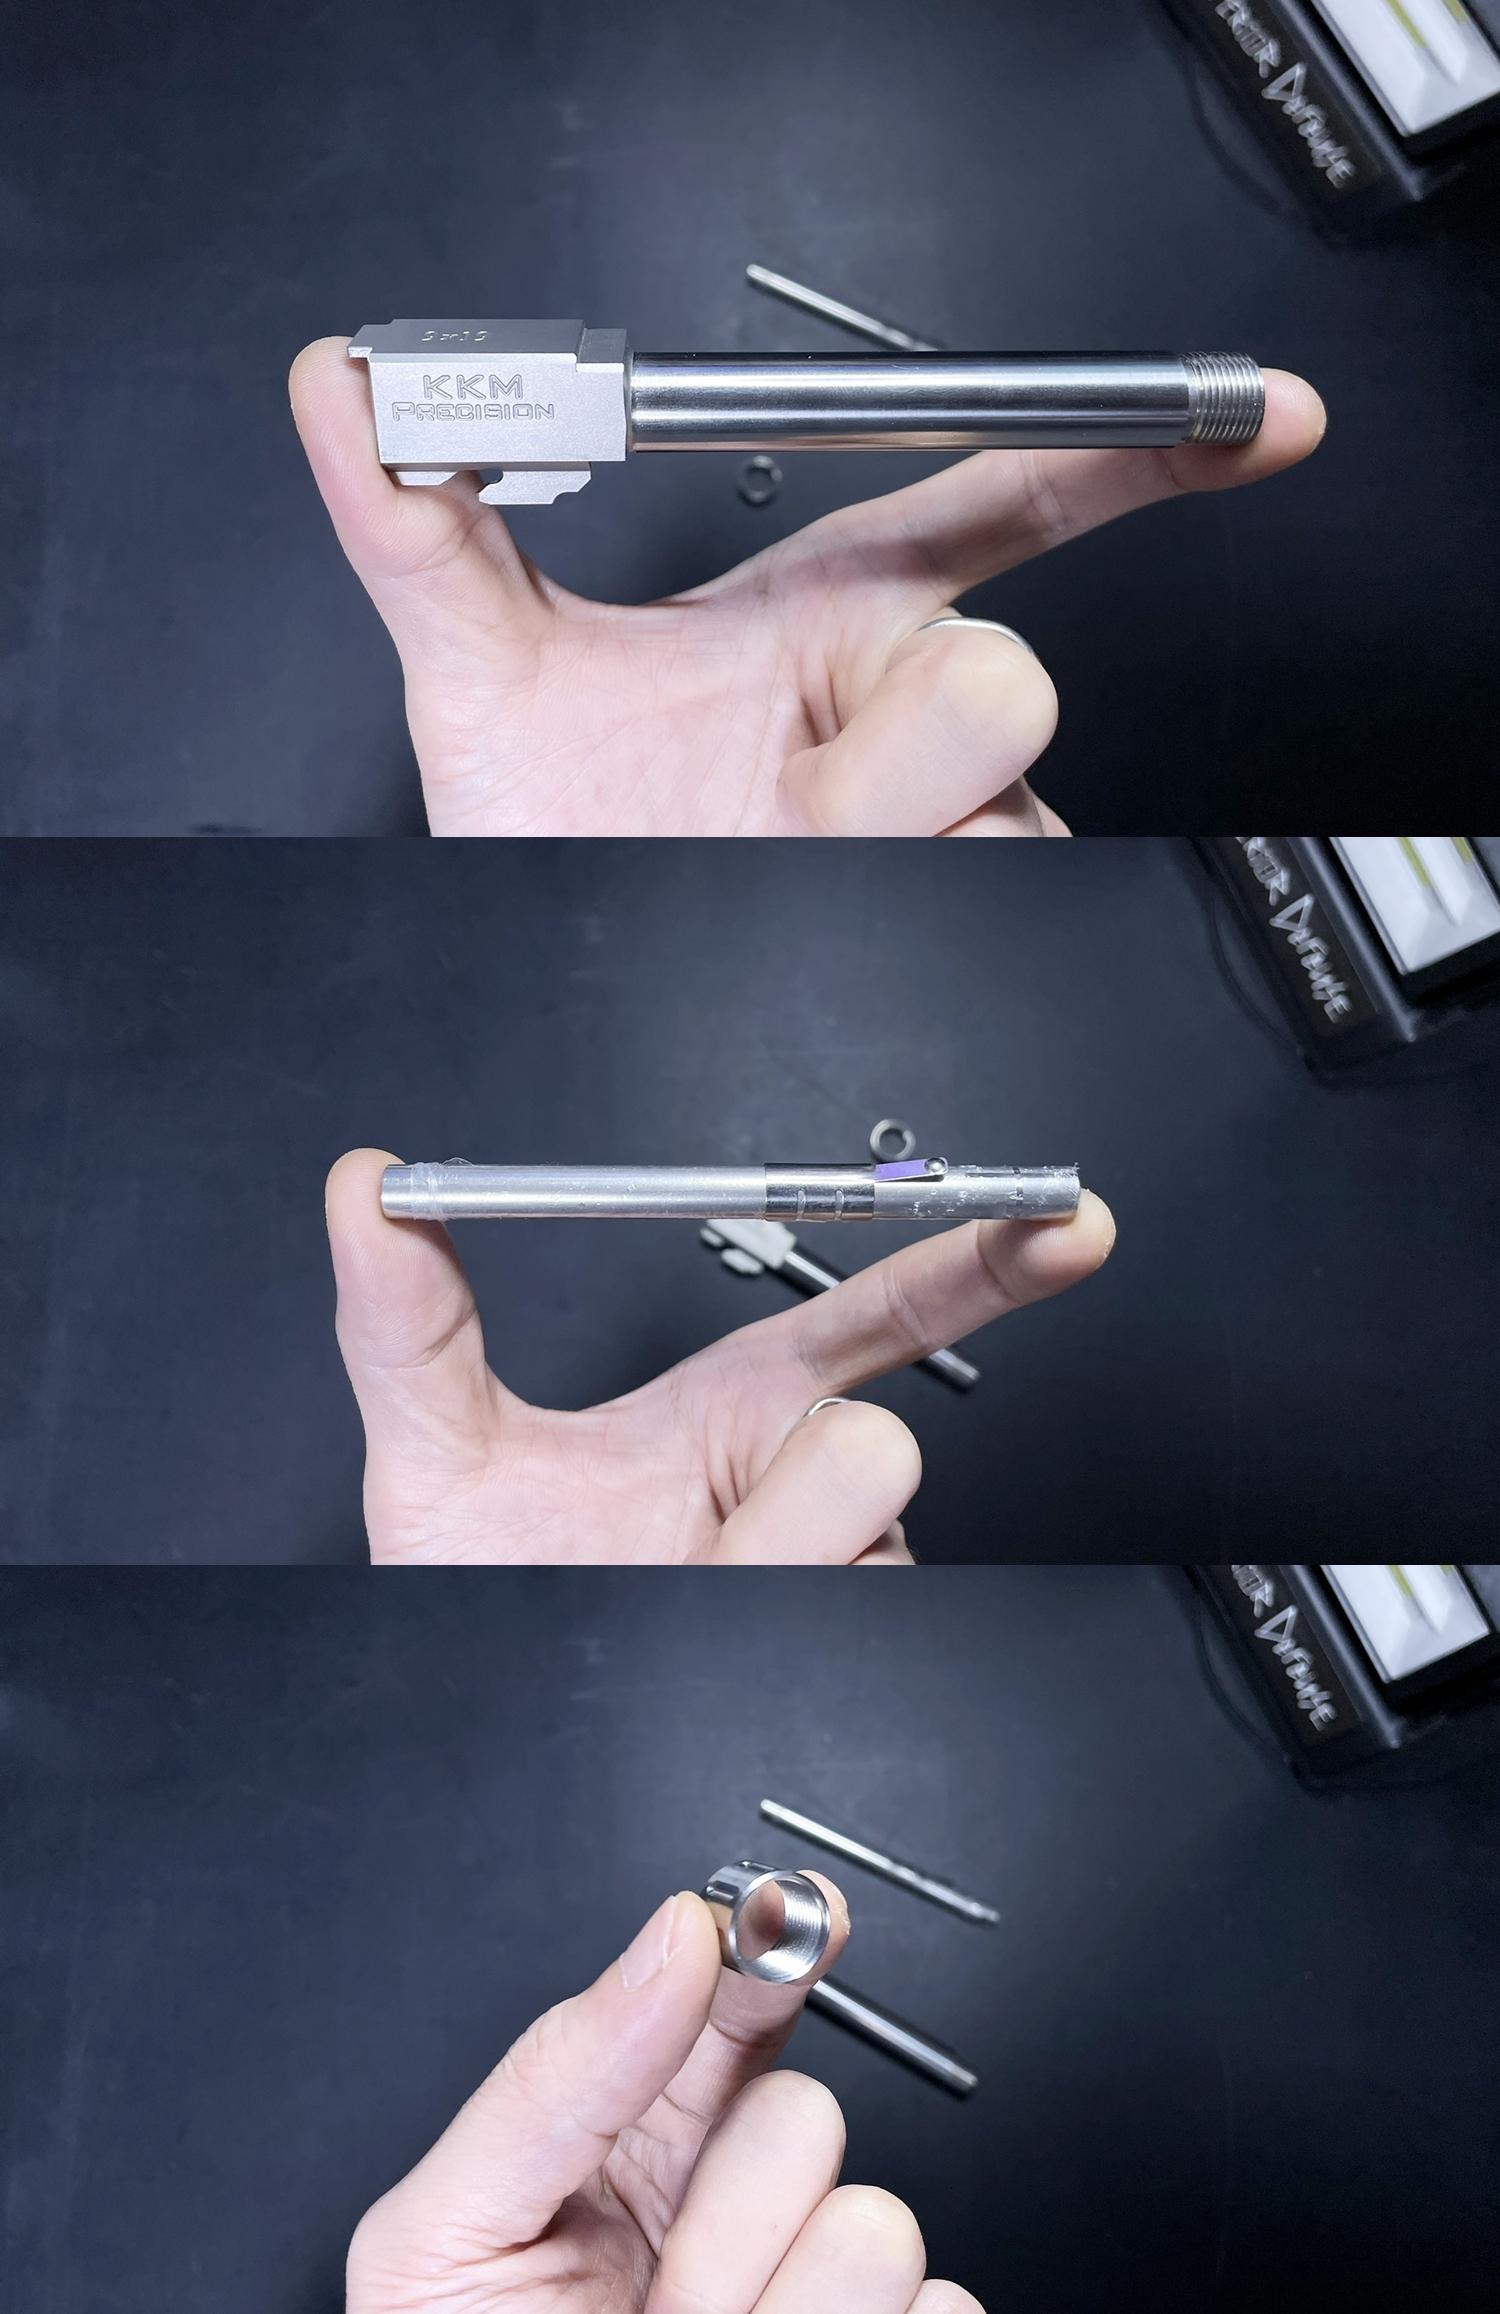 2 Guns Modify KKM PRECISION GLOCK ステンレスアウターバレル 東京マルイ G17 G18C GBB GET! リアルで重量感あるCNC 精密切り出し加工! BARREL+PROTECTOR+ショートリコイルアシストスプリング+インナーバレルセット